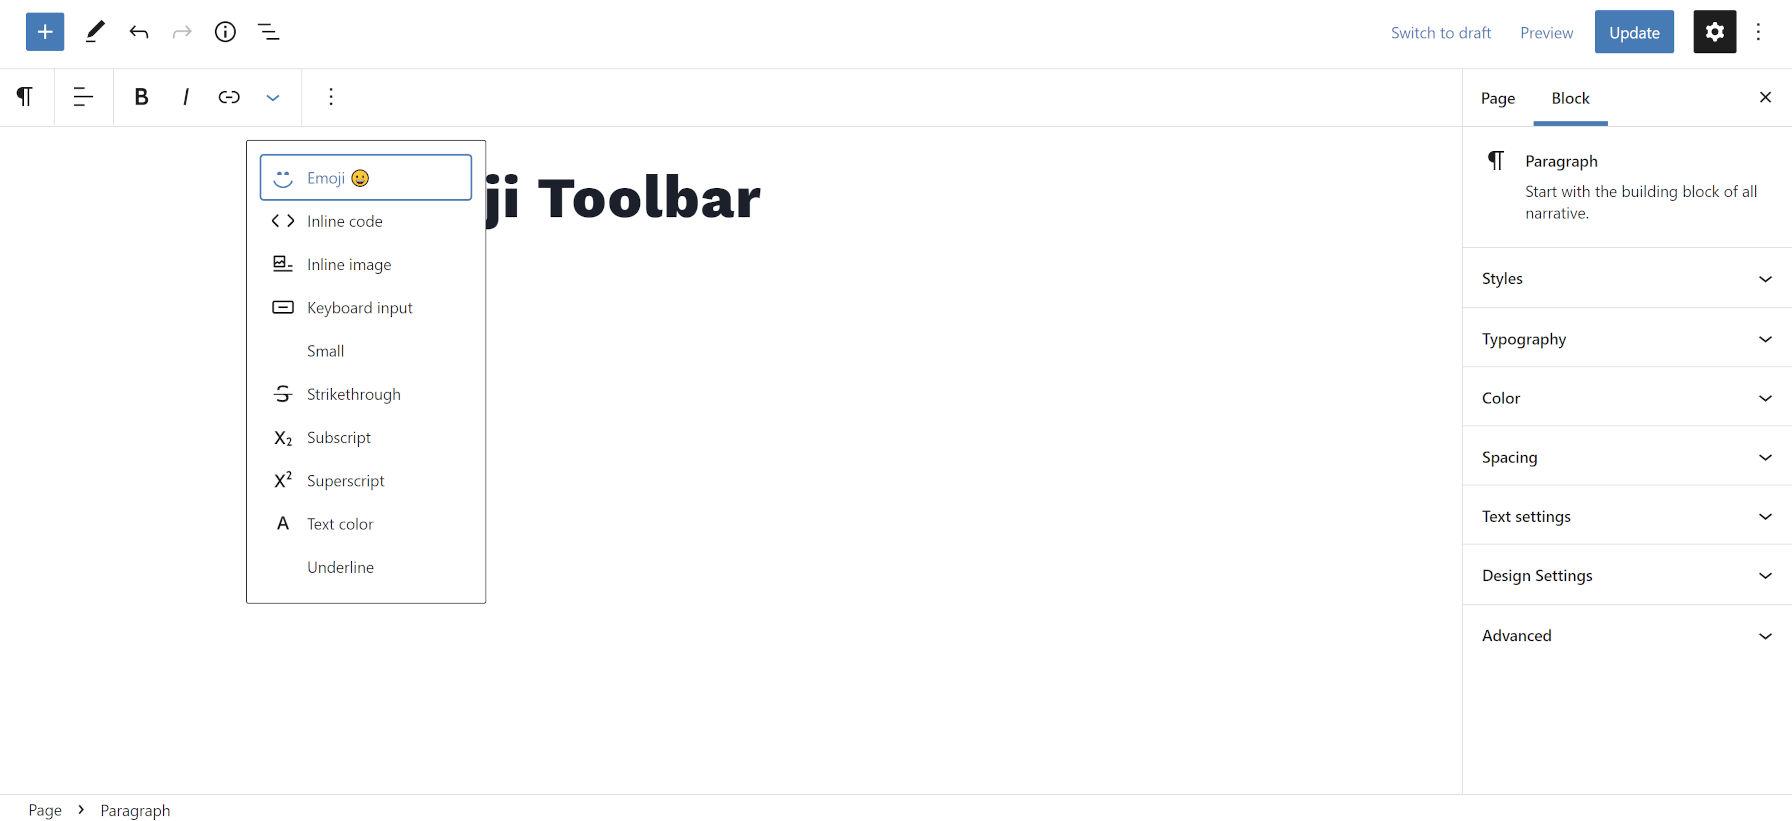 Elenco dei pulsanti a discesa dal plug-in Emoji Toolbar nell'editor di WordPress.